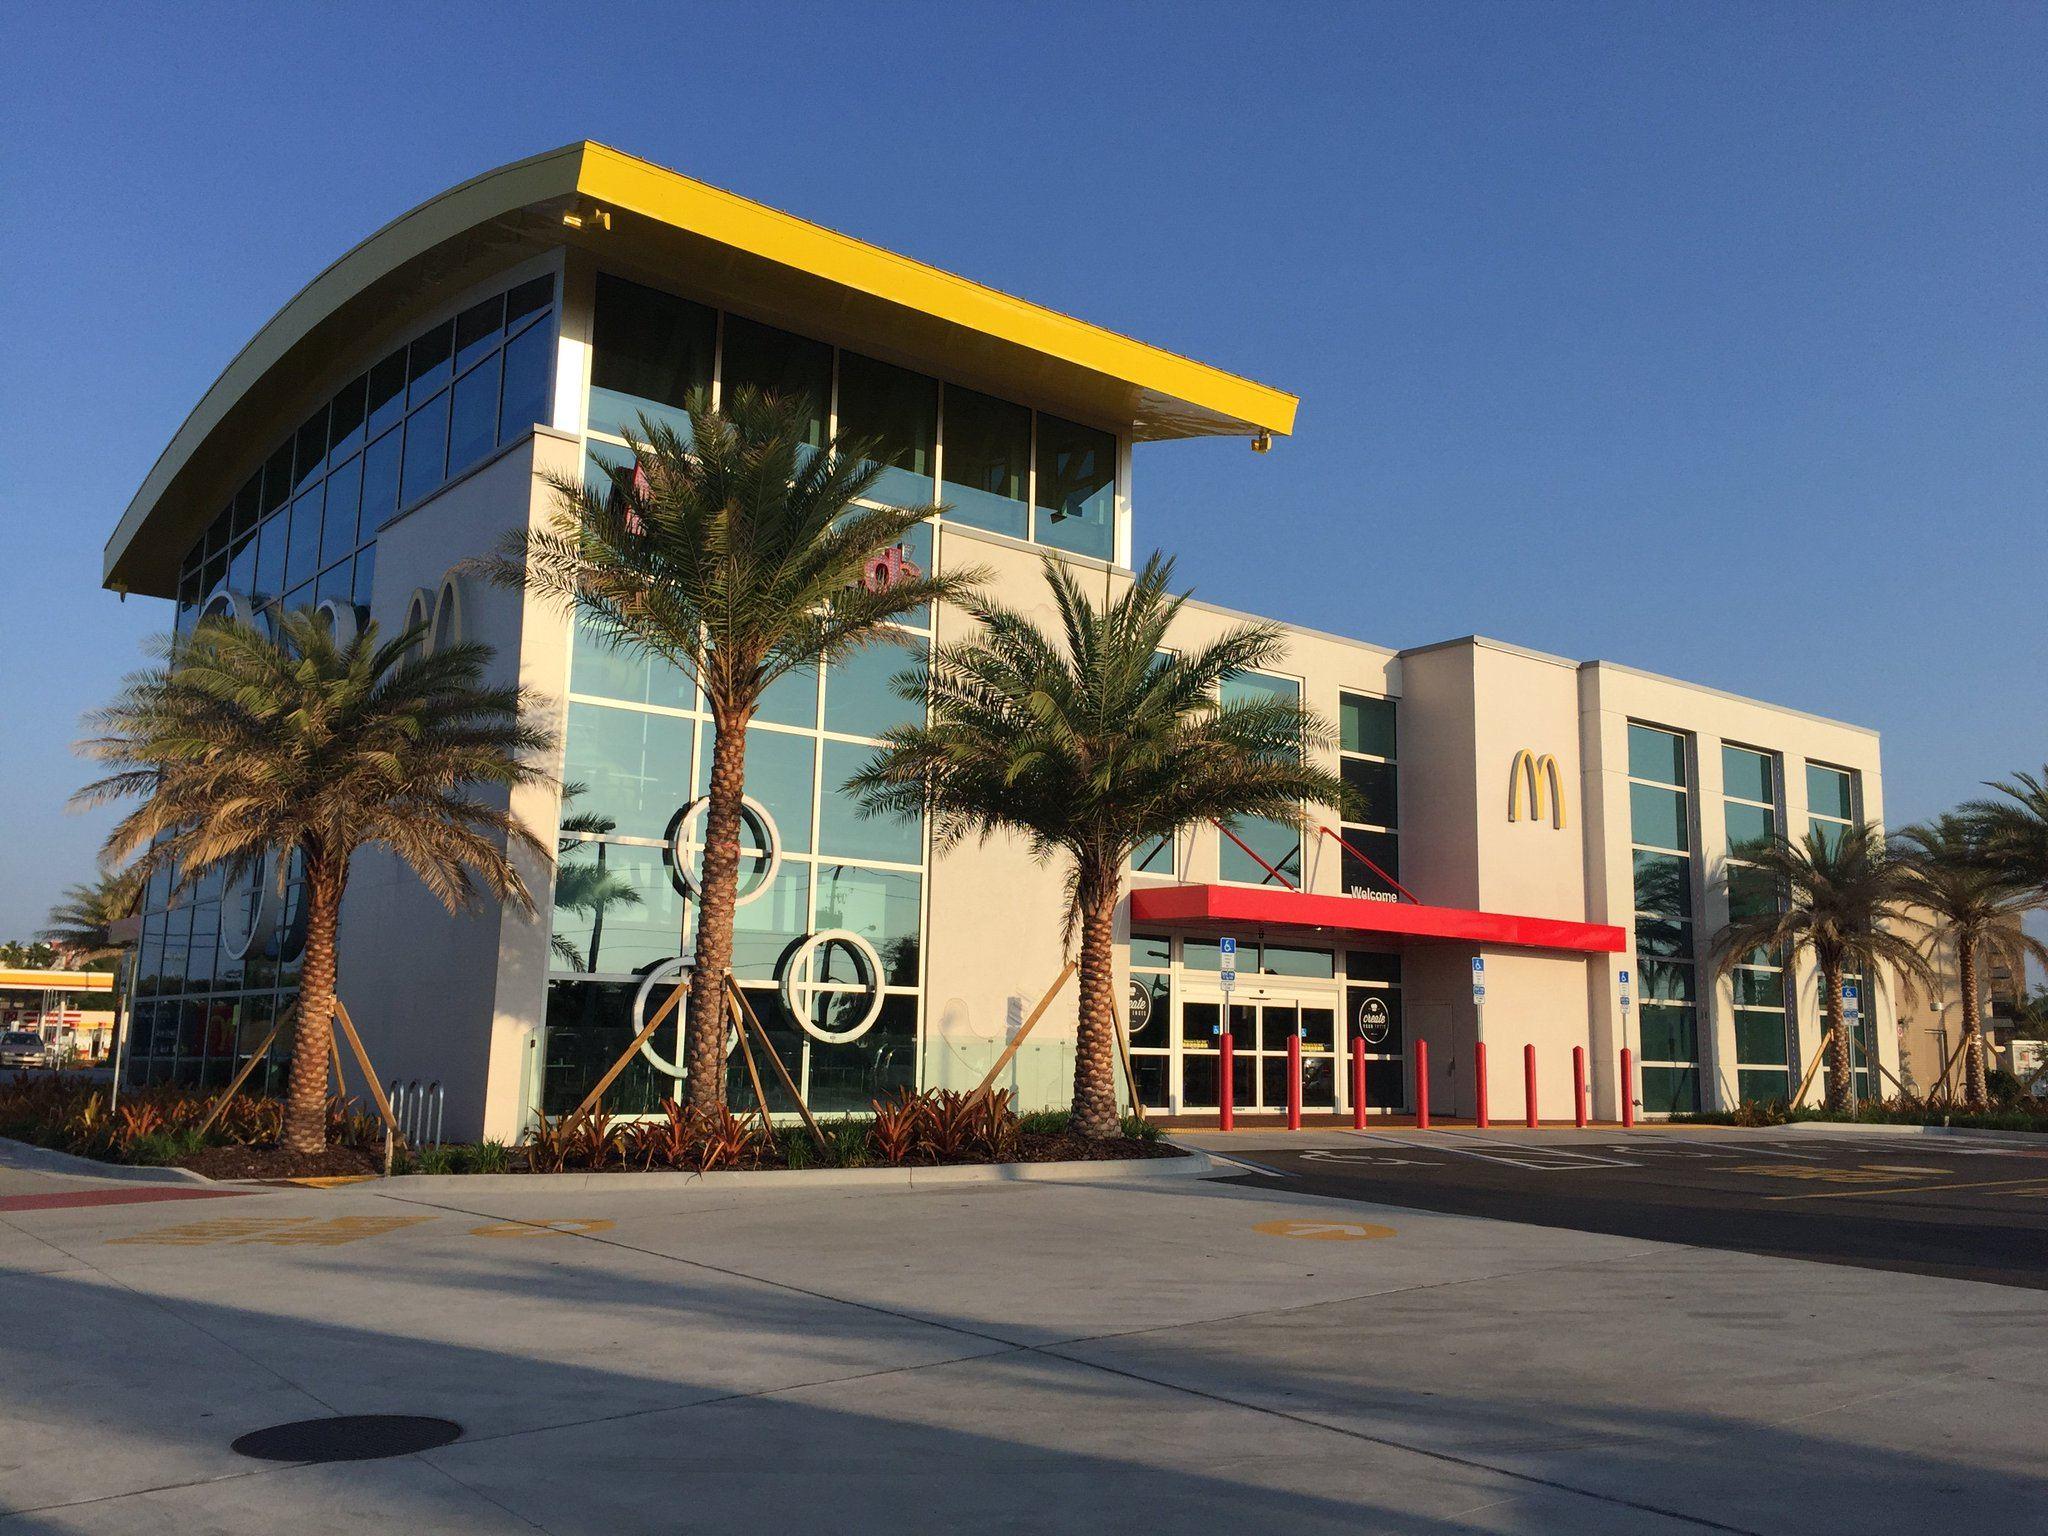 EpicMcD Orl largest McDonalds